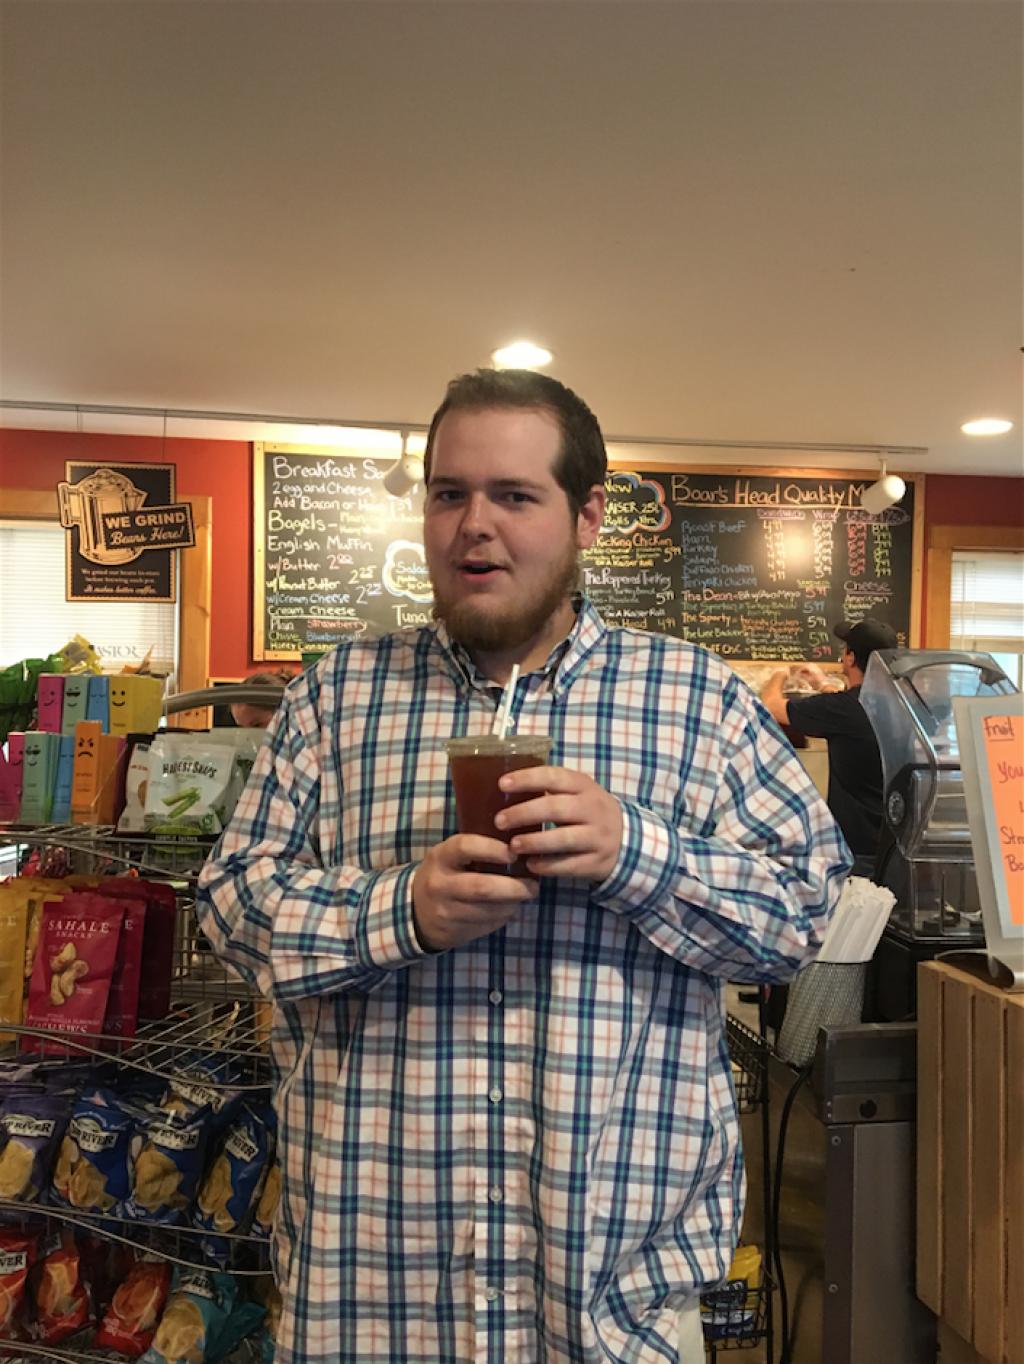 Castleton's caffeine cravings